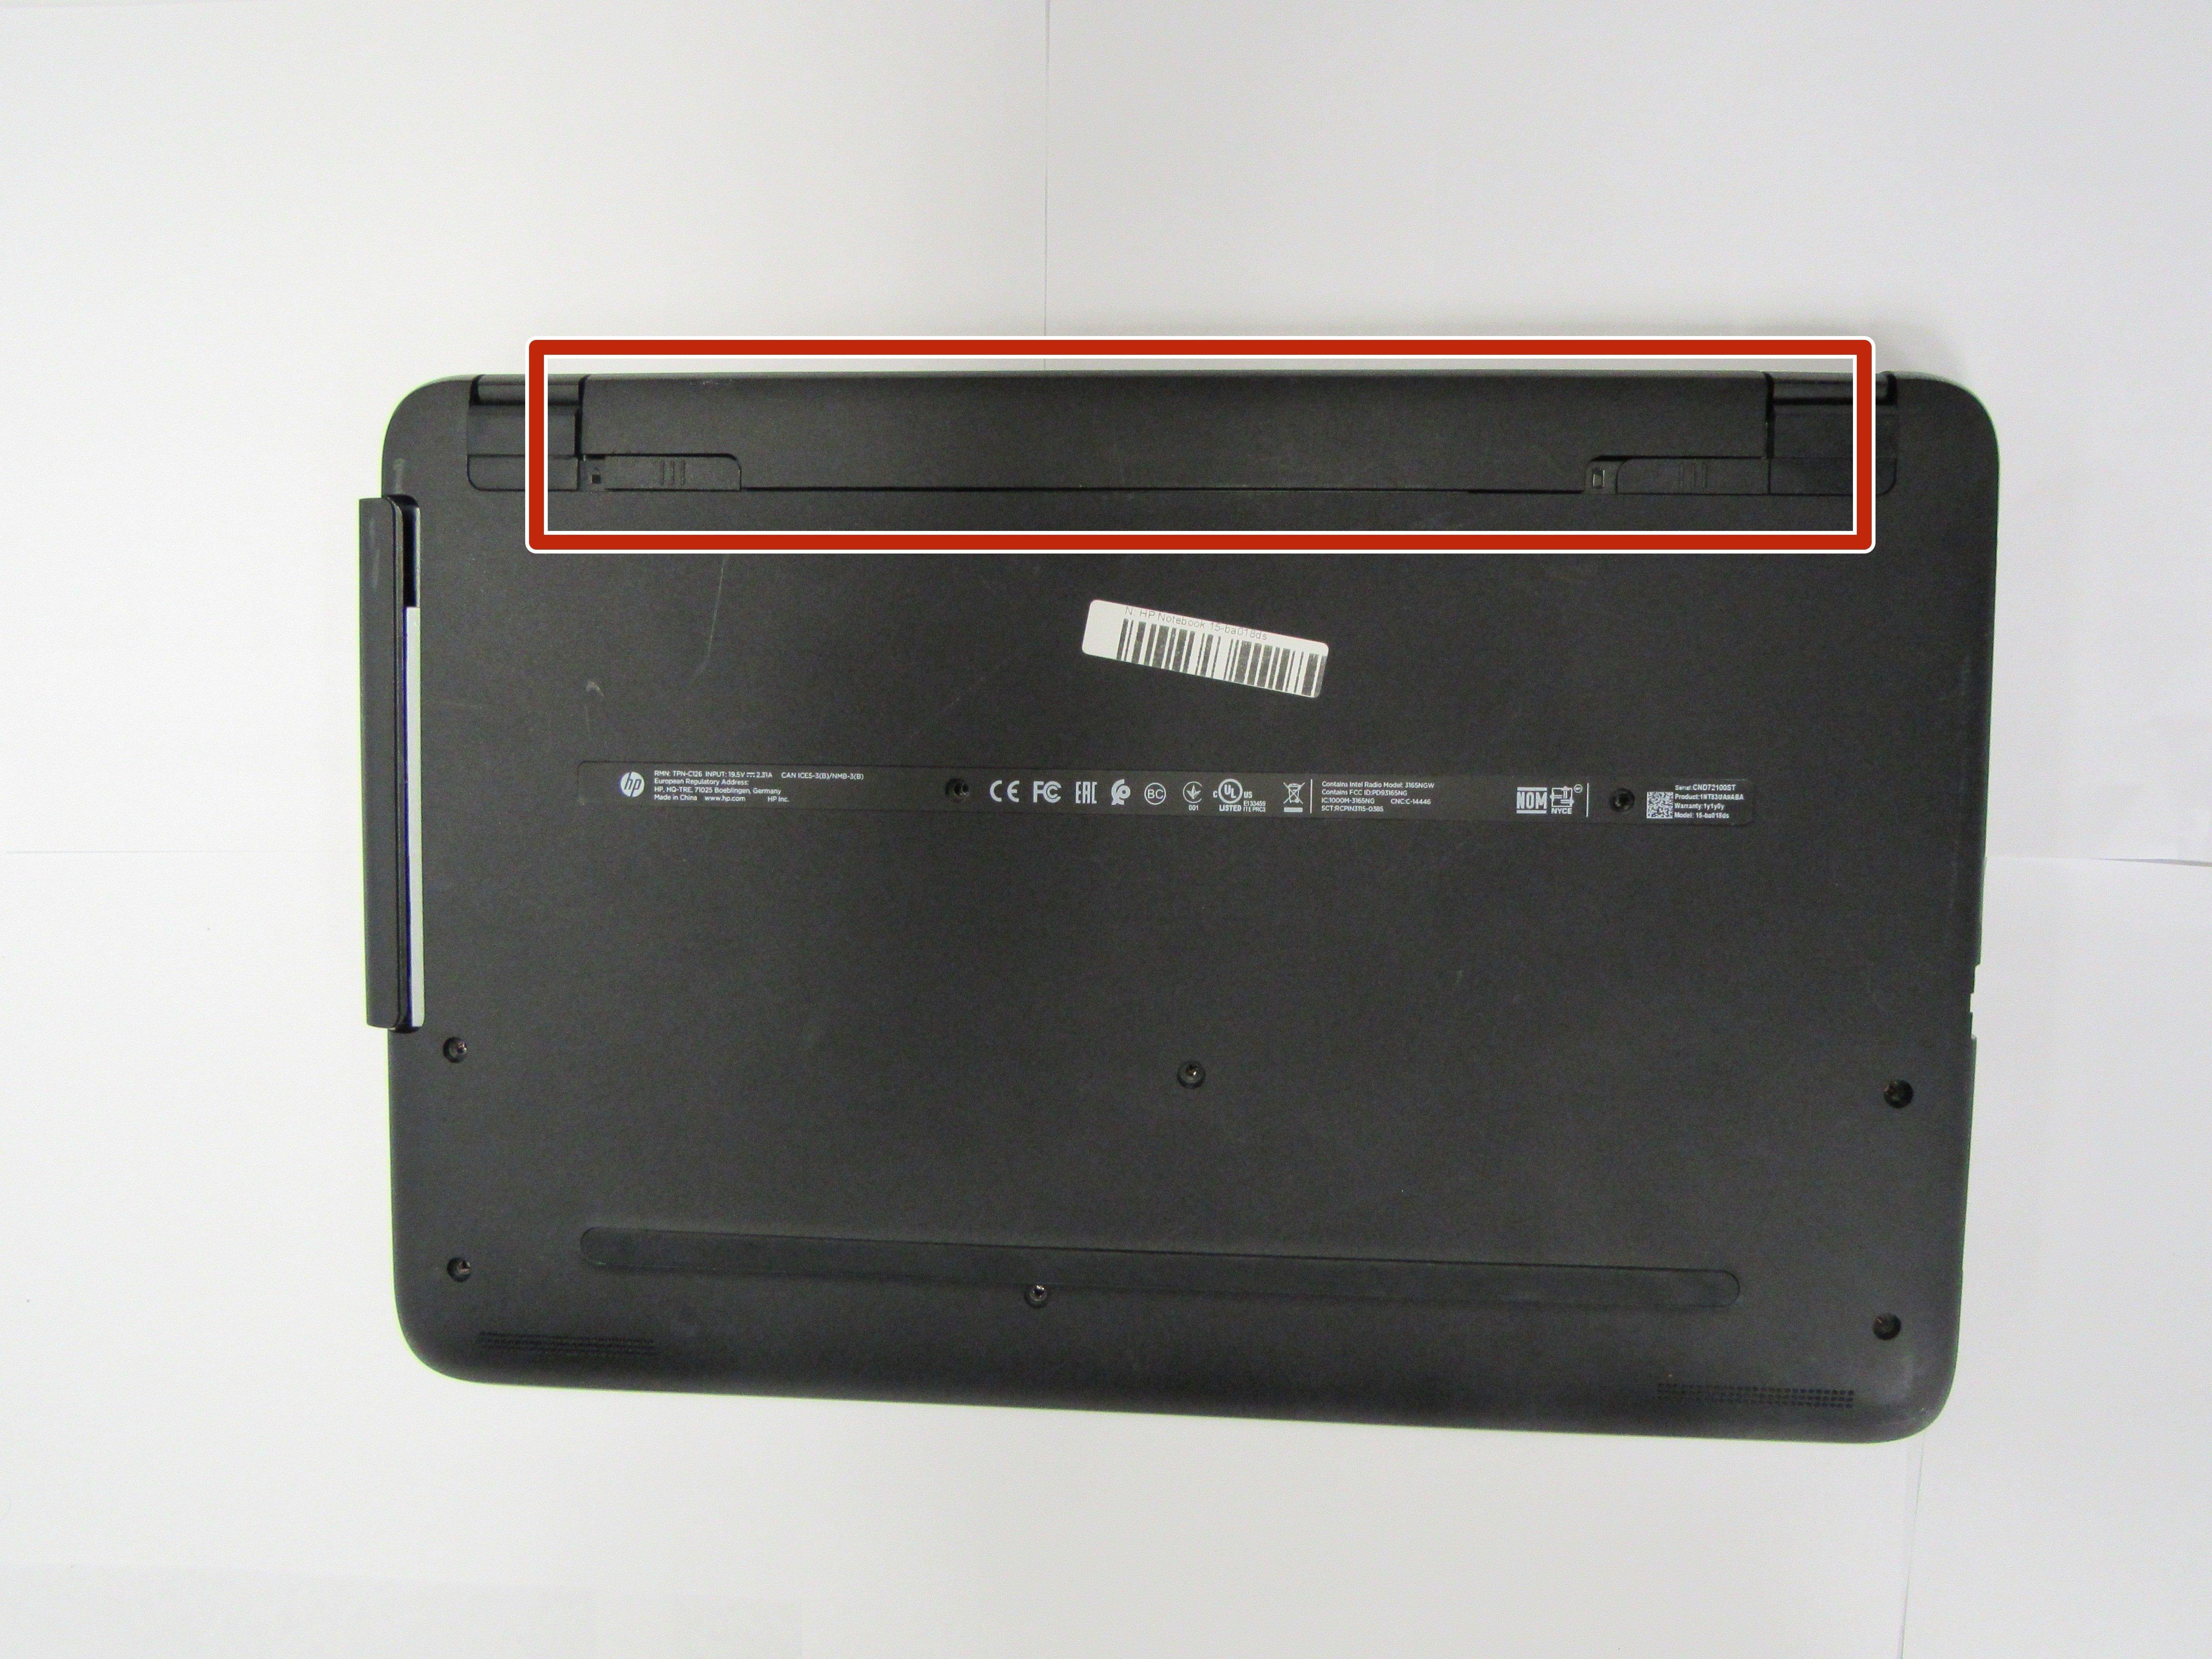 Hp Notebook 15 Ba018ds Battery Replacement Ifixit Reparaturanleitung